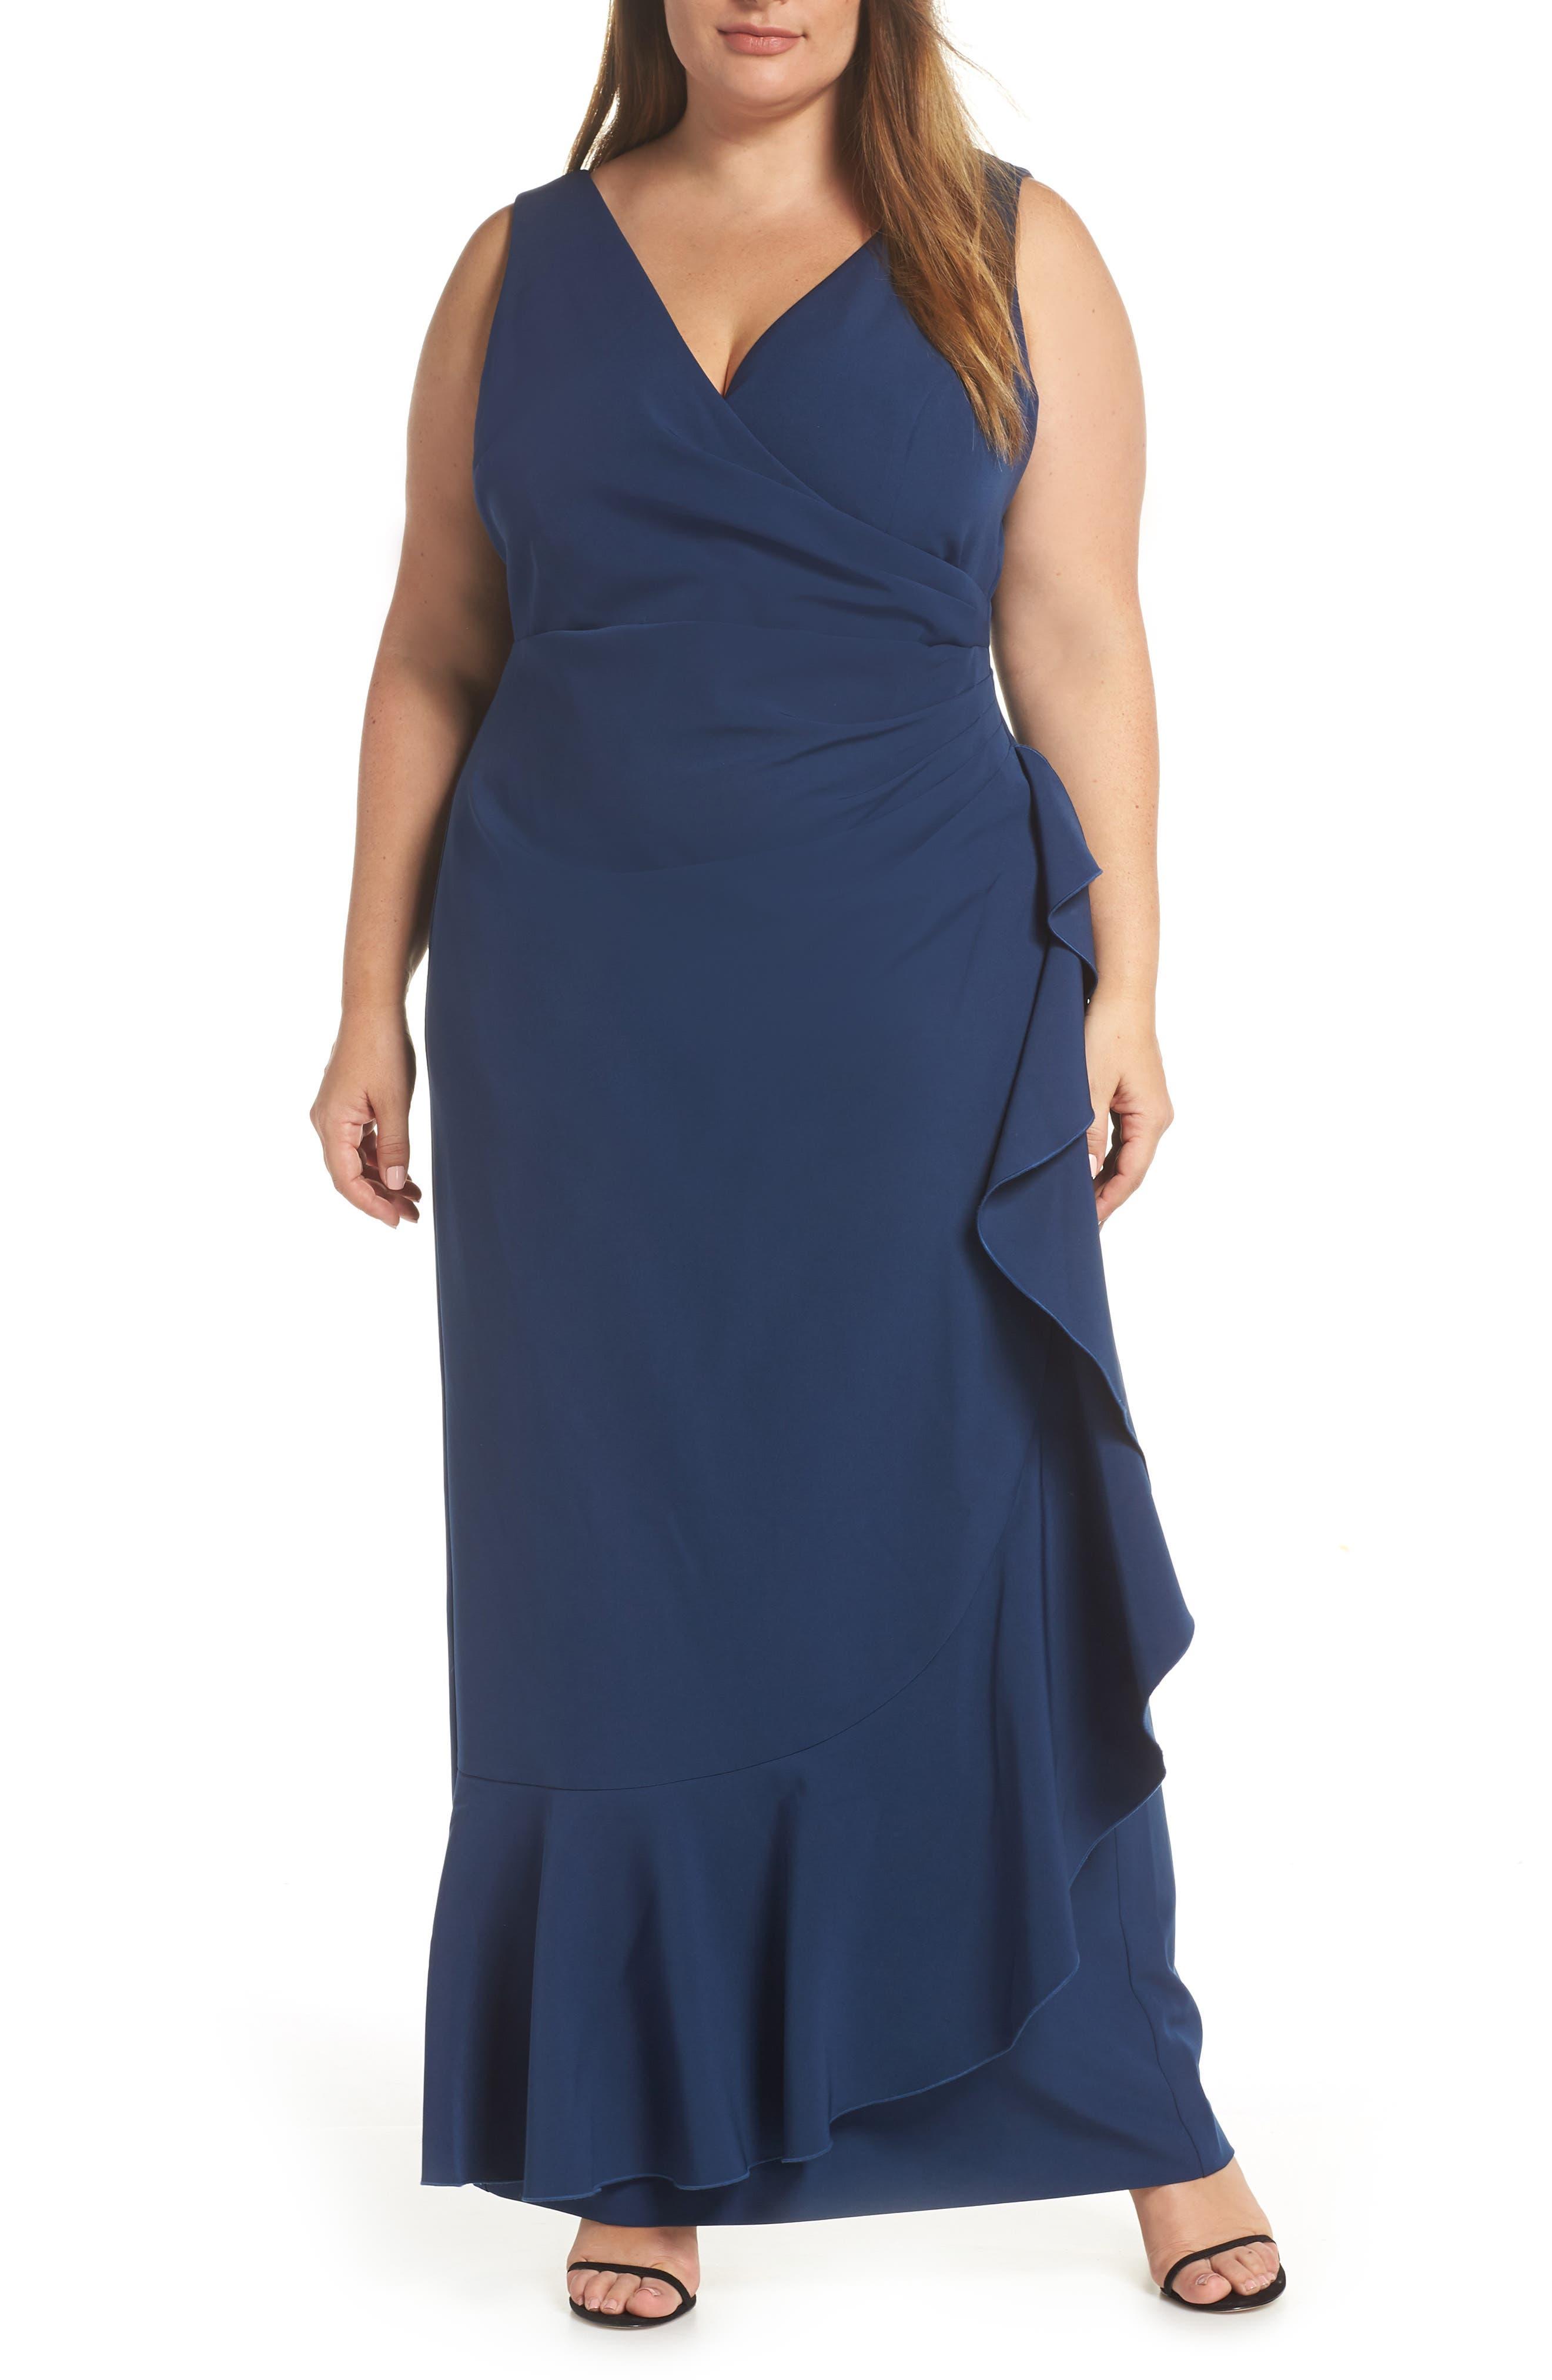 VINCE CAMUTO, Side Drape Ruffle Gown, Main thumbnail 1, color, 421